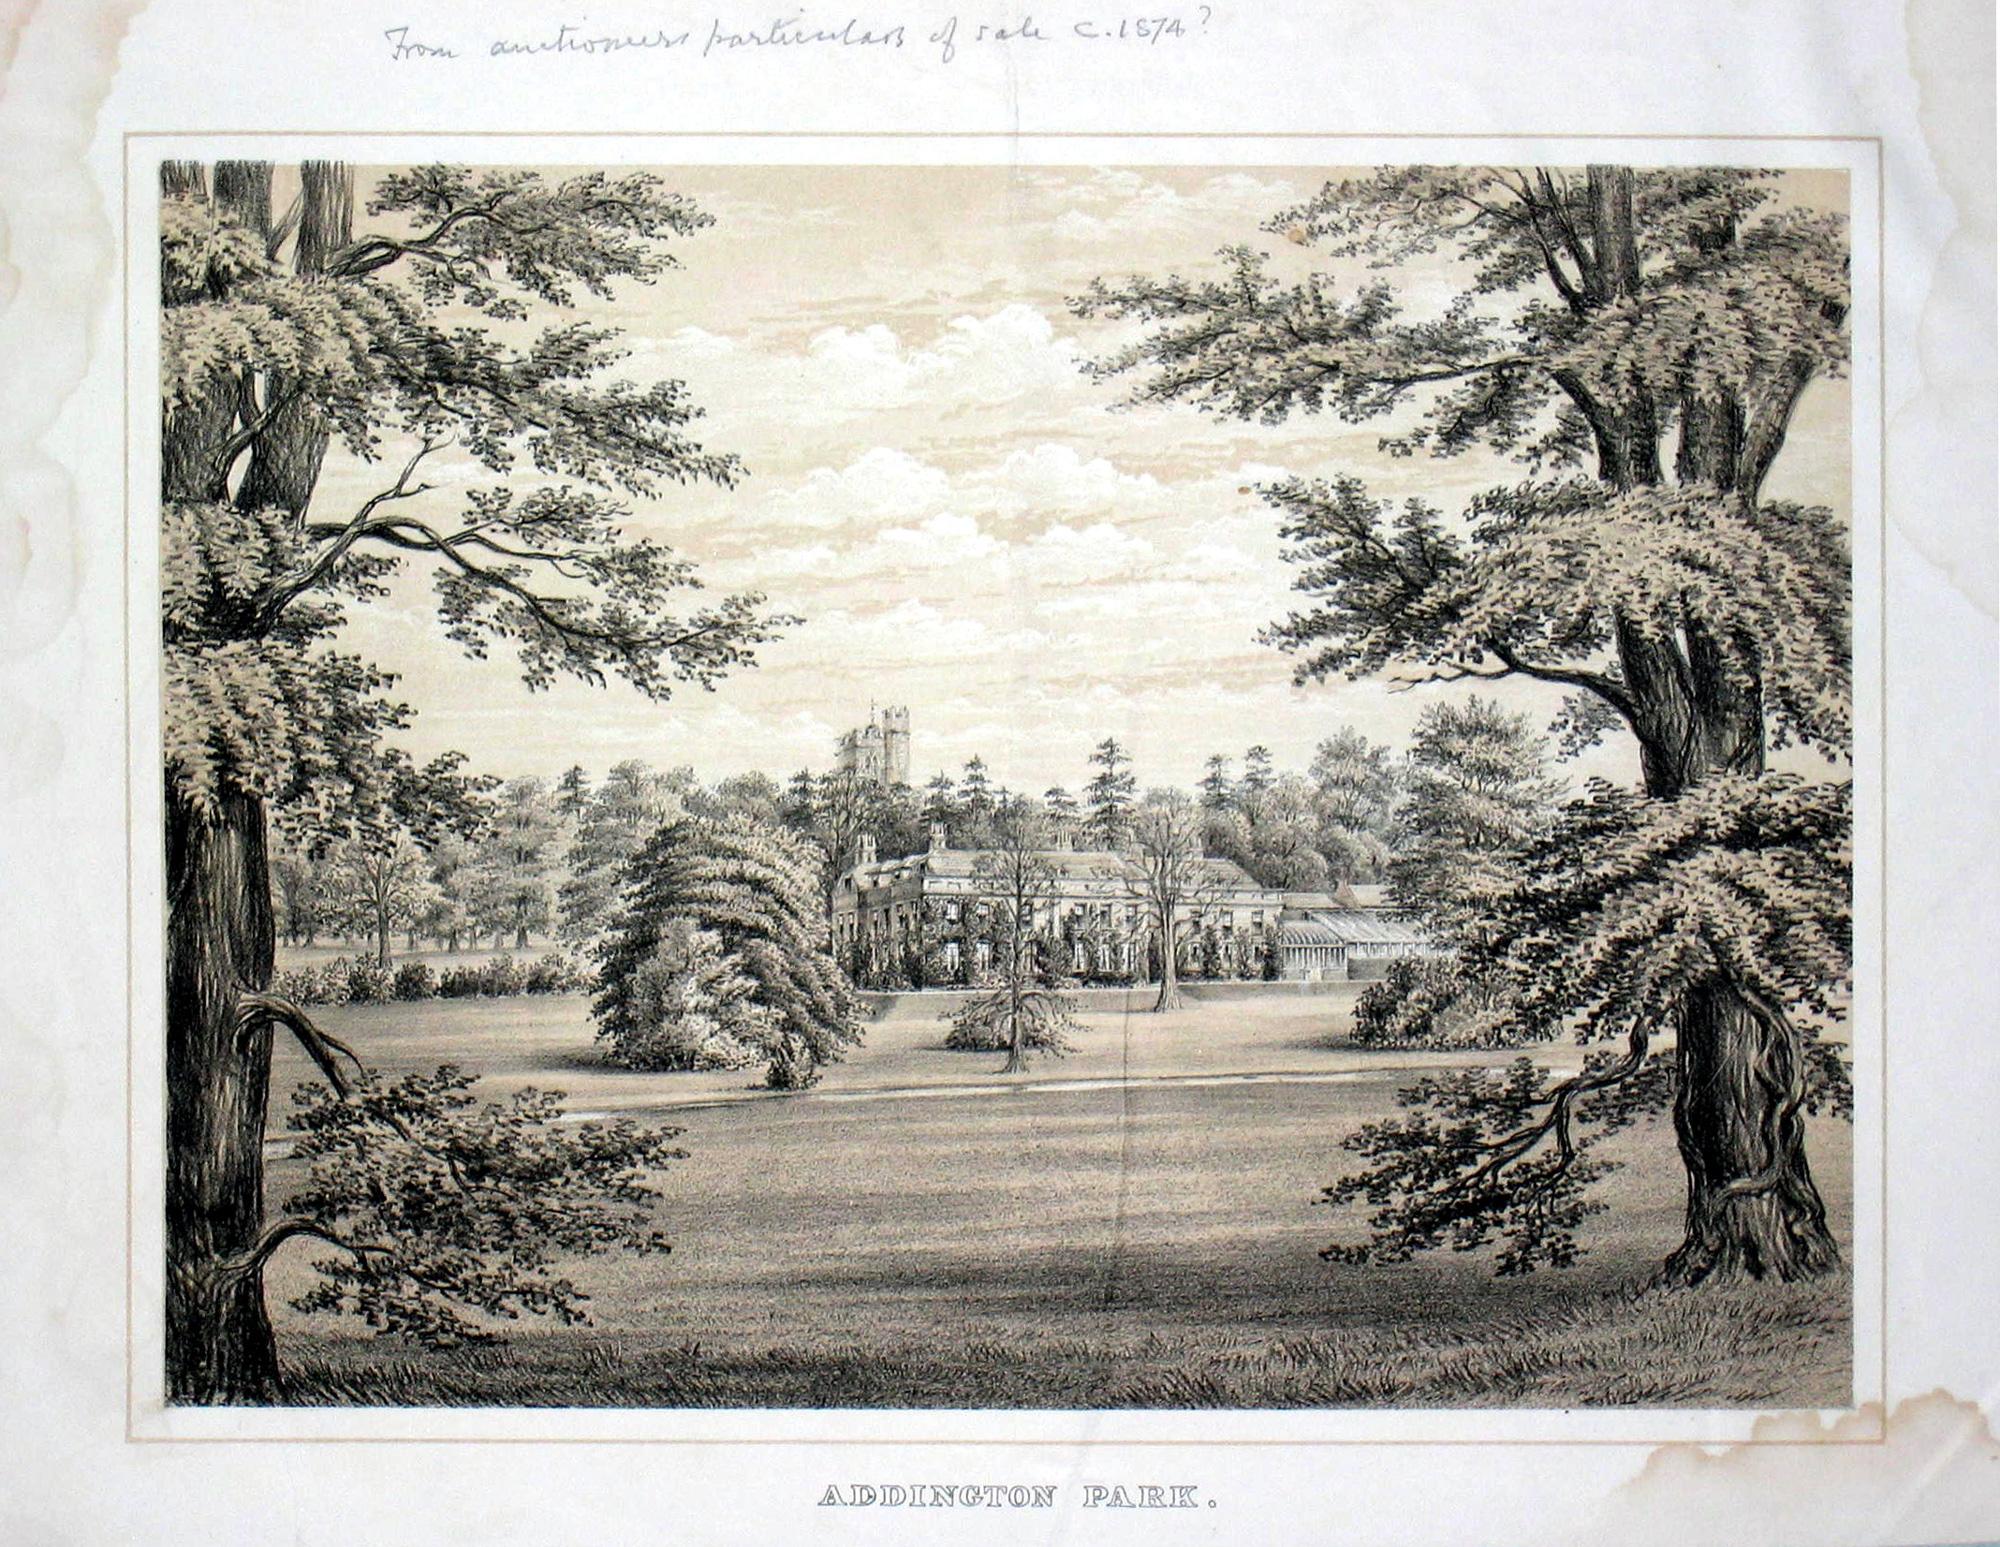 Addington Park 1883